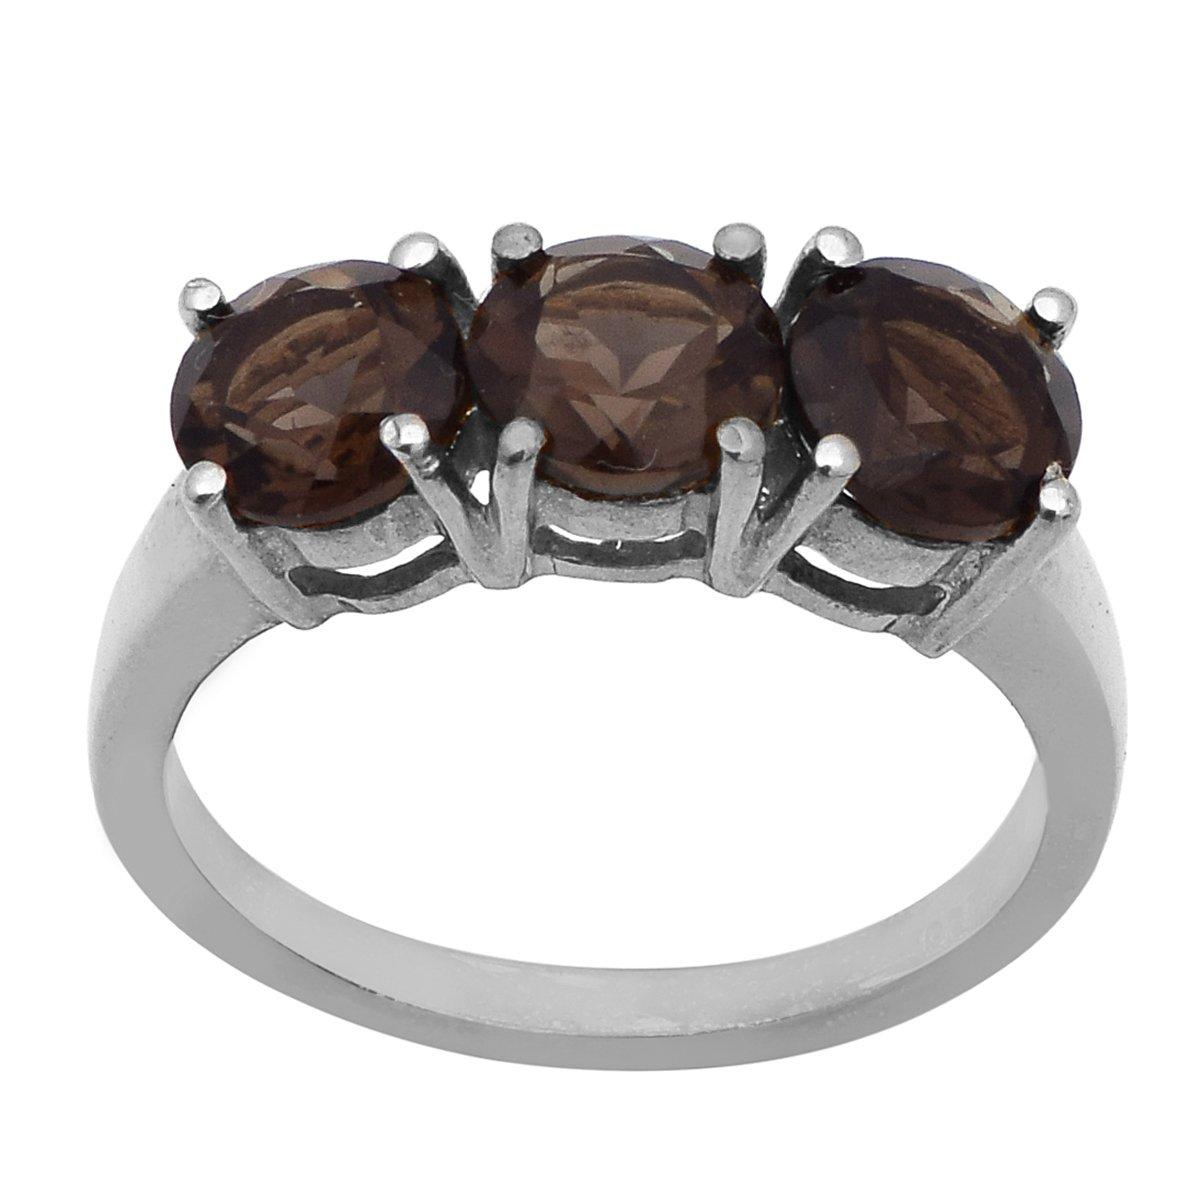 Newest Design Jewelry 925 Sterling Silver Smoky Gemstone Ring